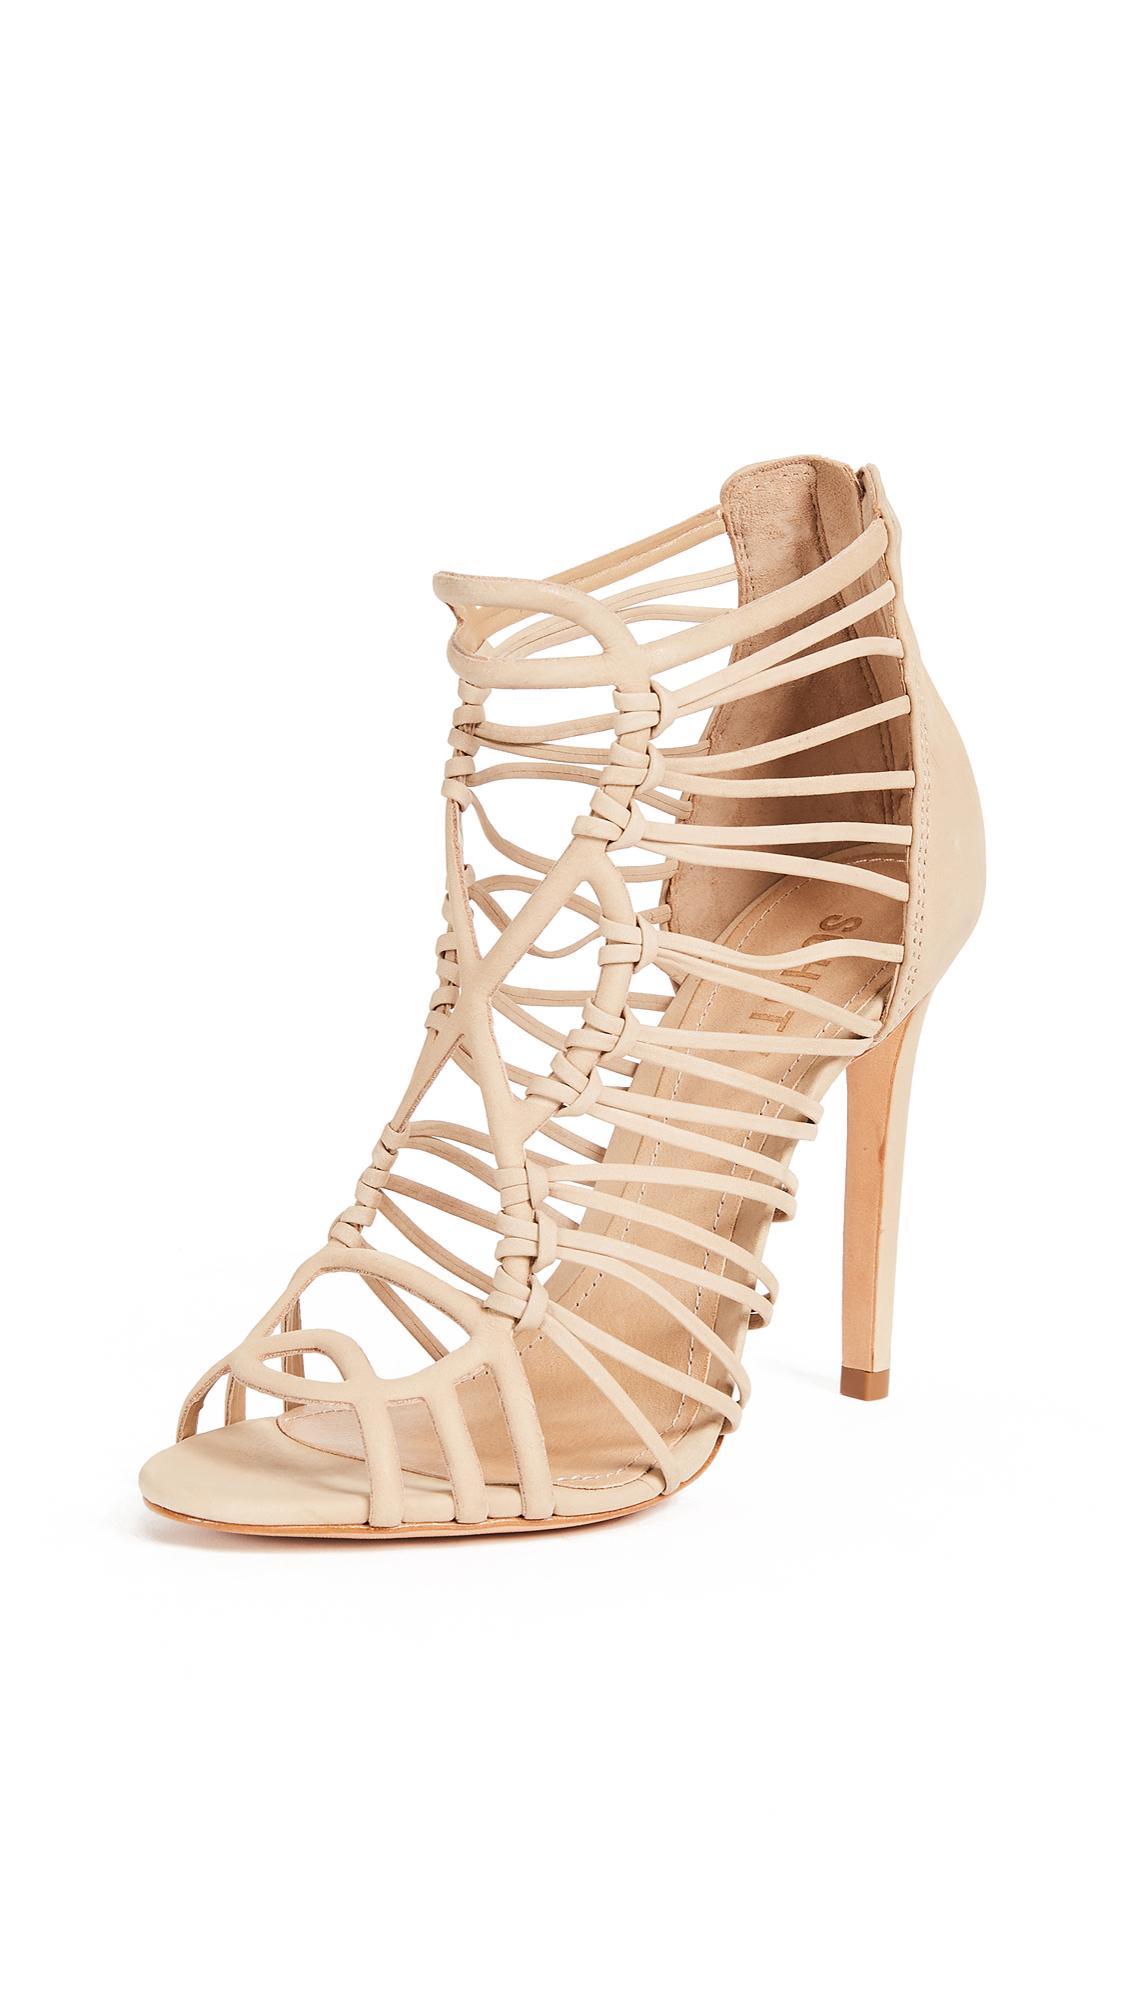 Schutz Naama Caged Sandals - Amber Light